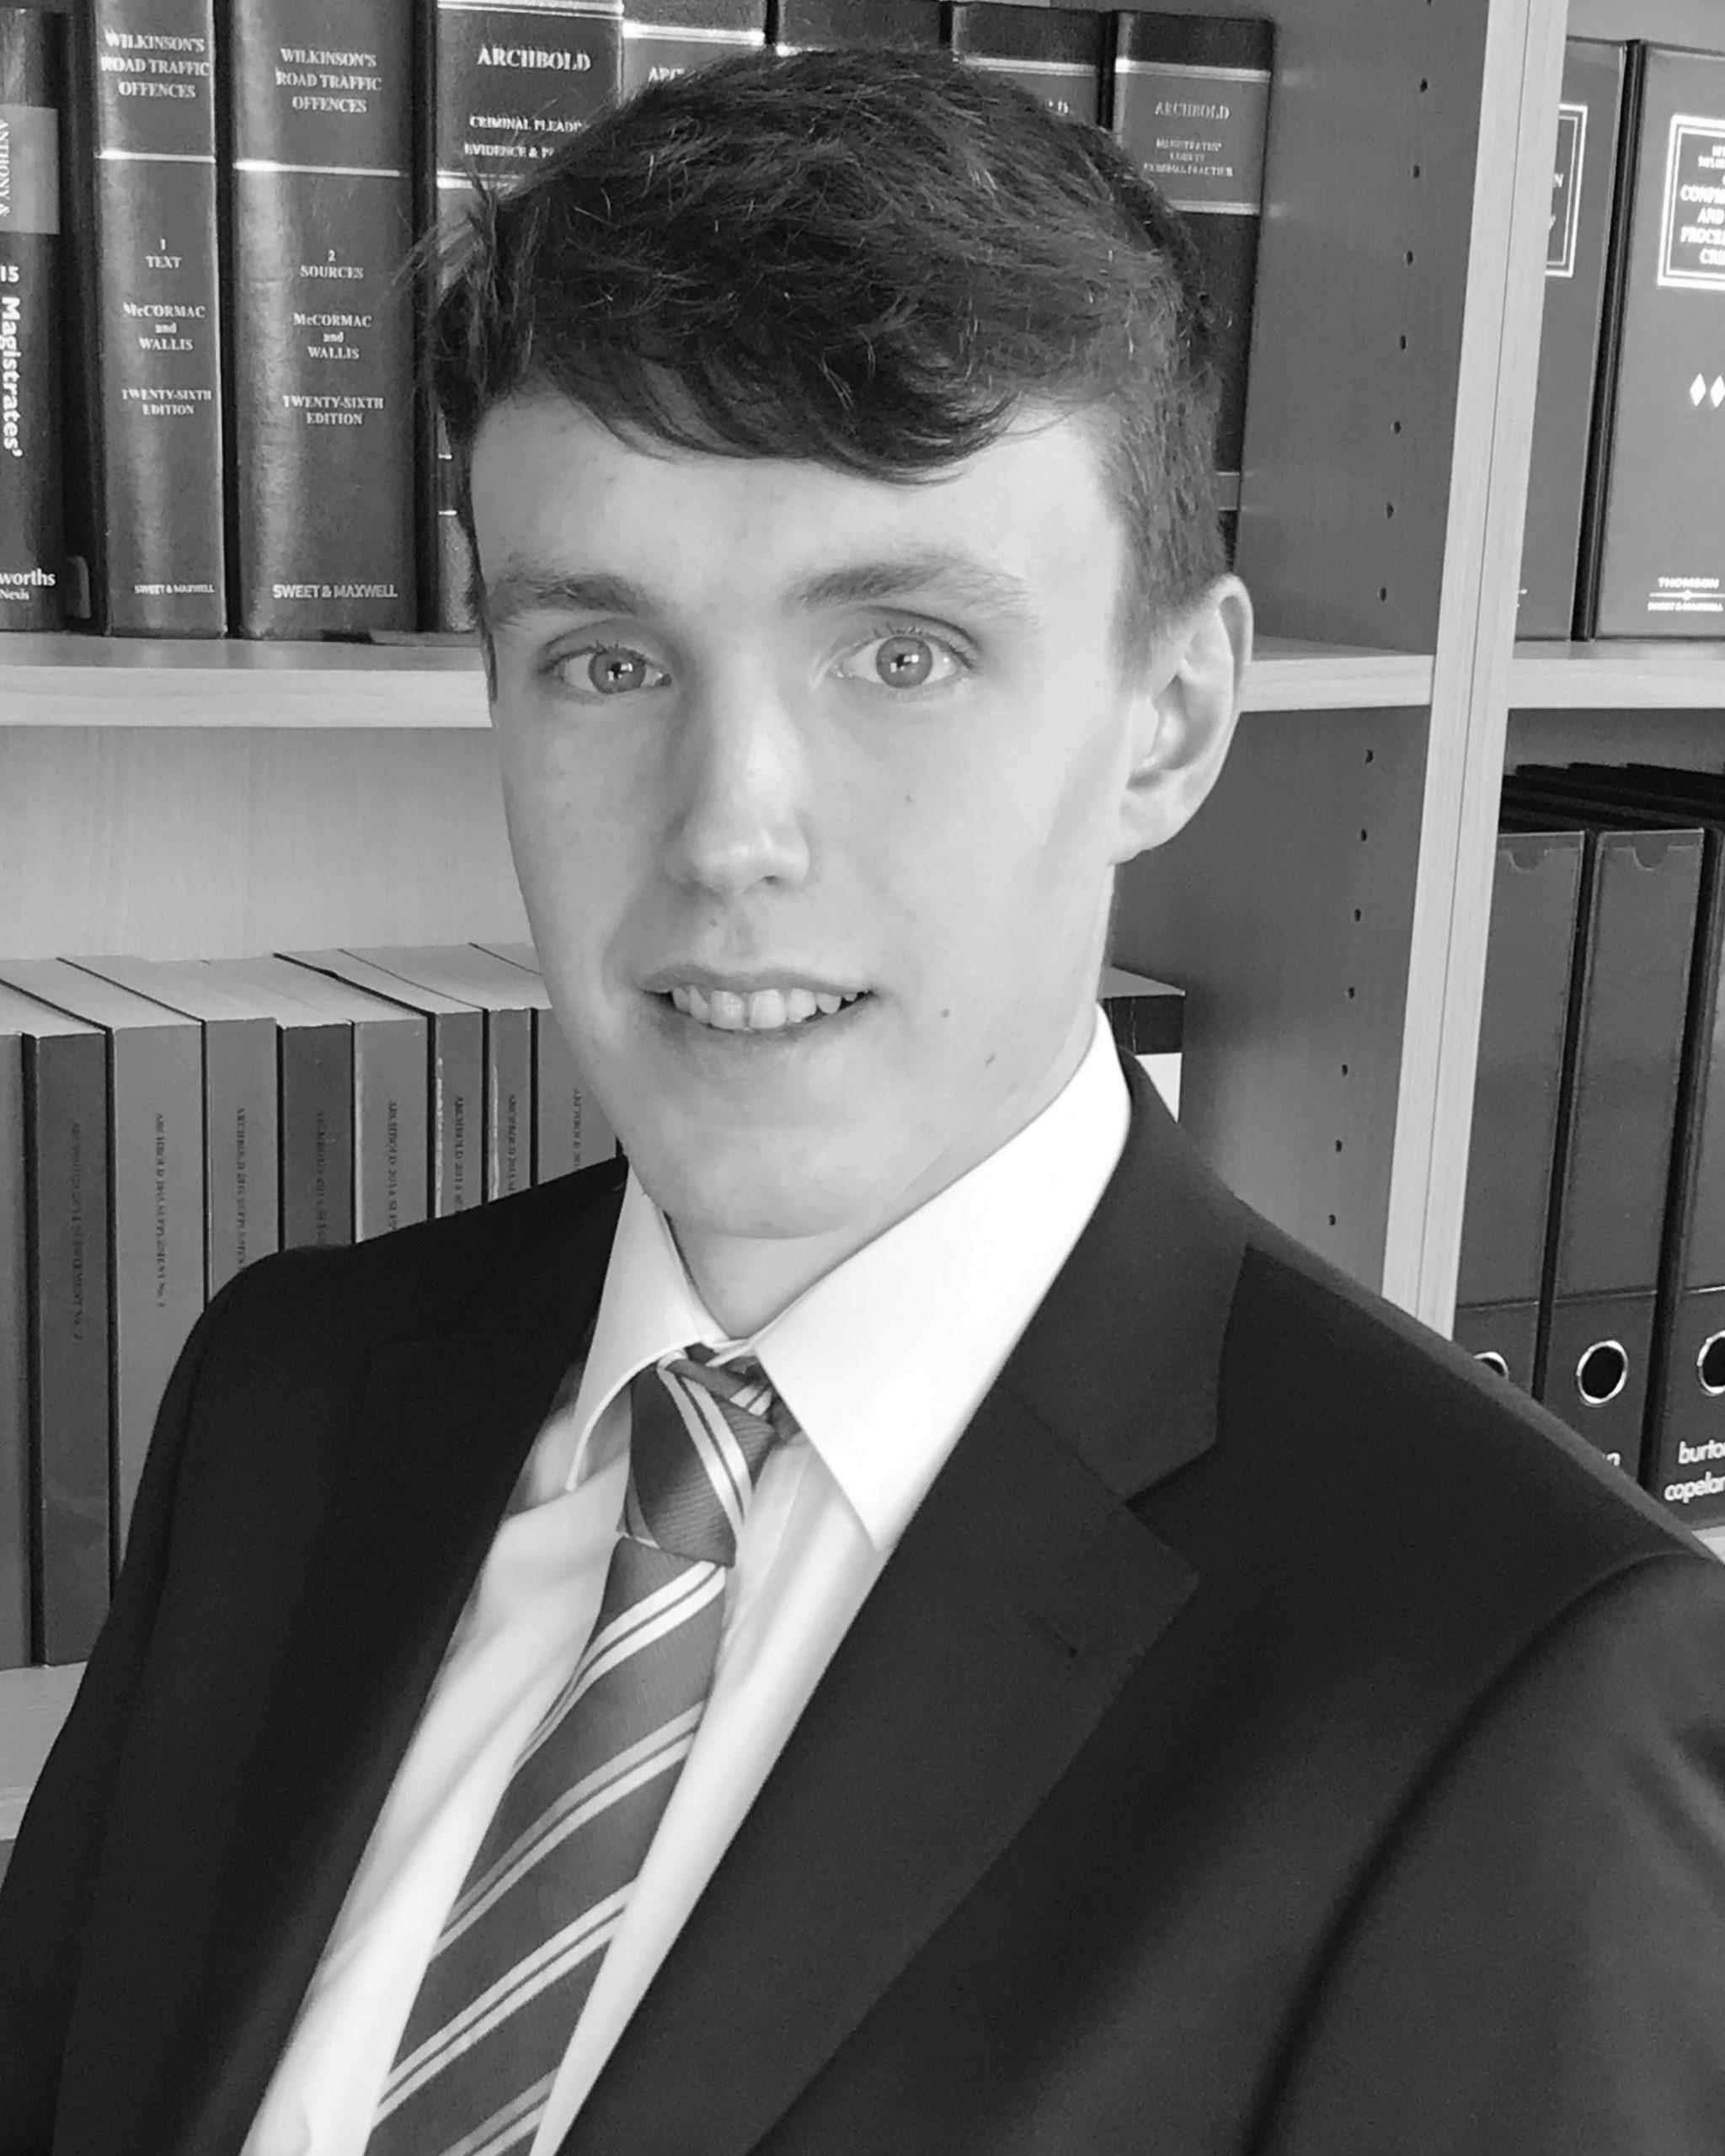 A professional headshot of Burton Copeland Paralegal, Daniel Walton.